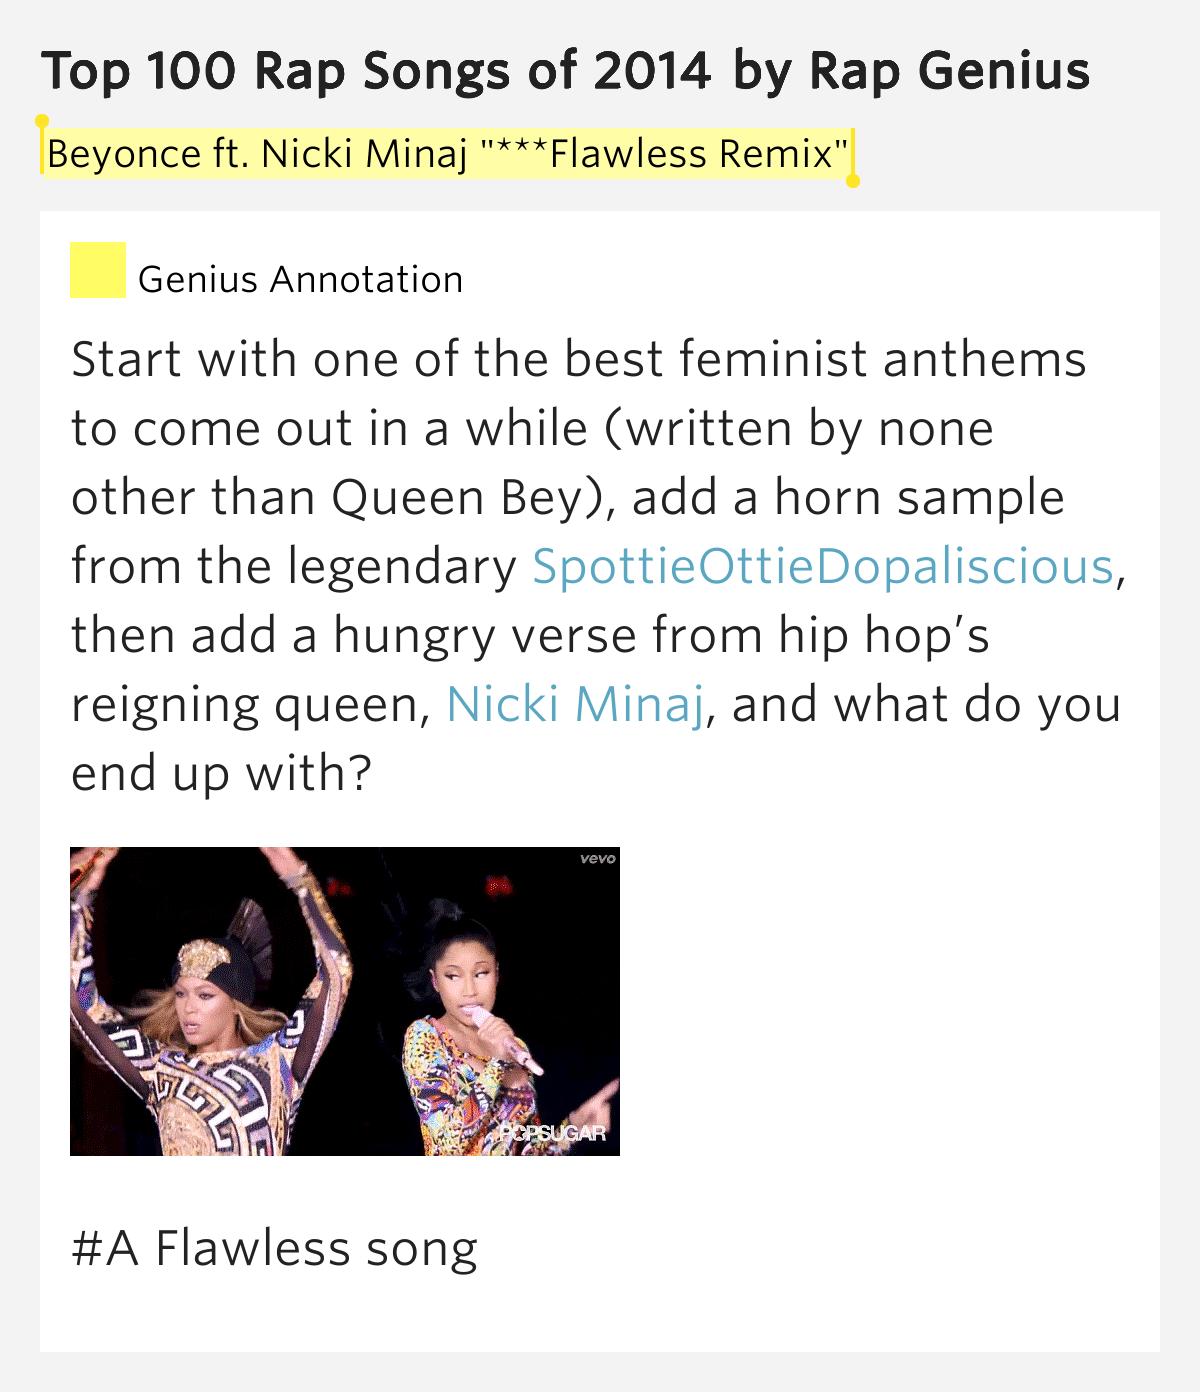 AOL Starting Up Music-Video Web Channel | Billboard